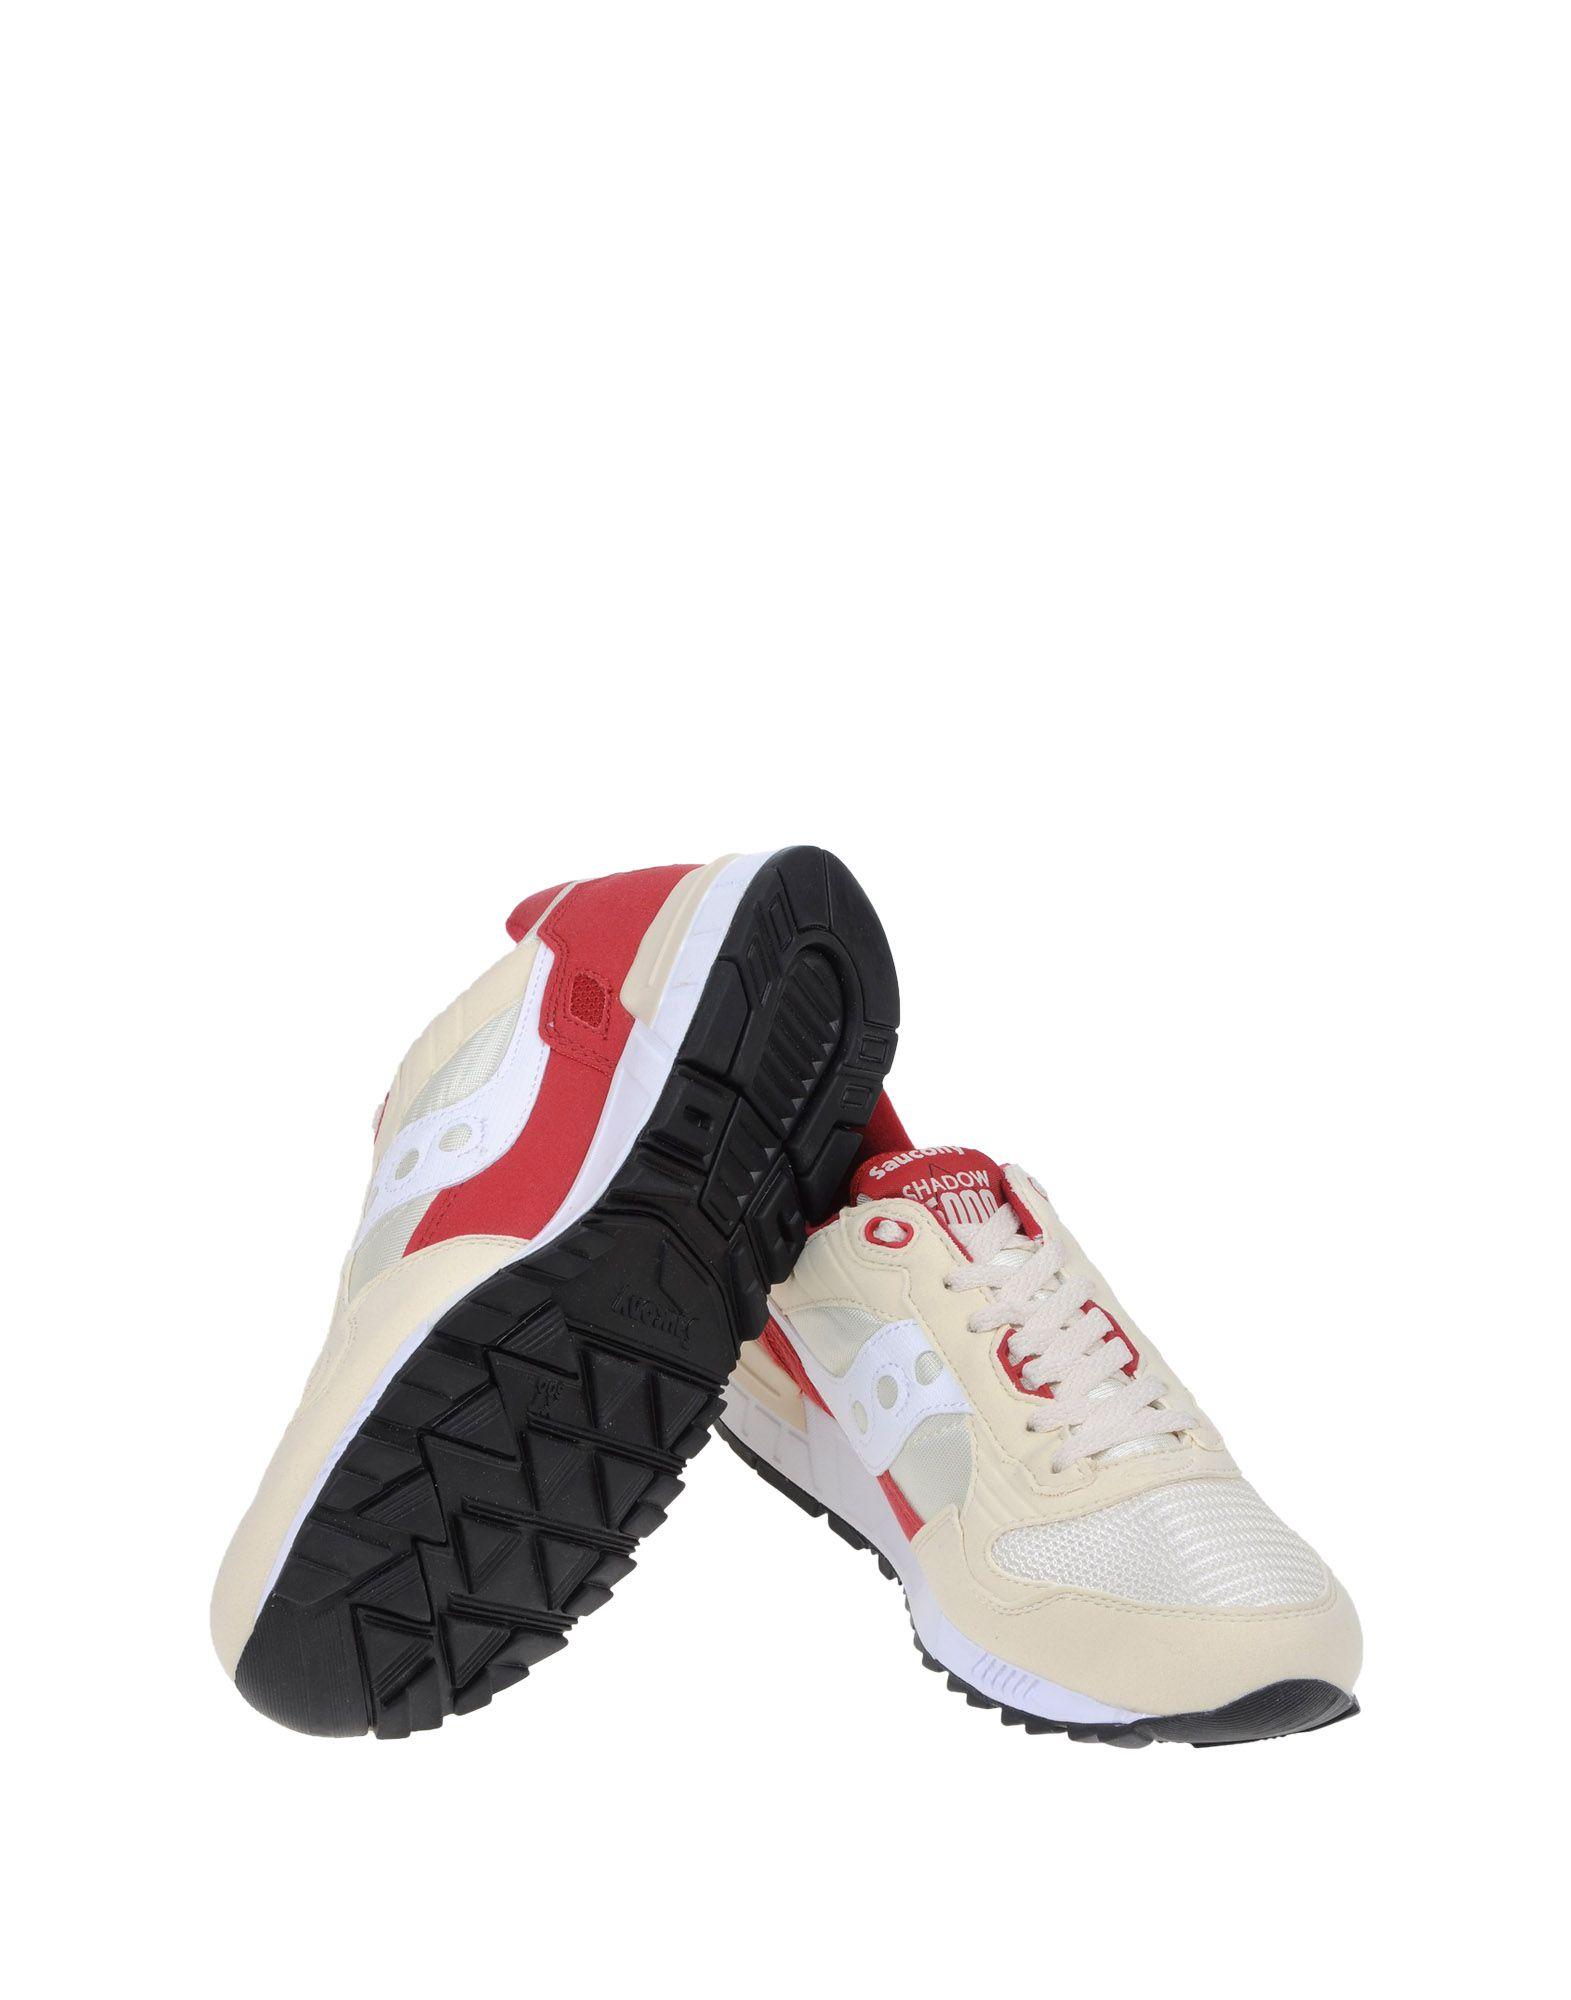 Sneakers Saucony Shadow 5000 - Homme - Sneakers Saucony sur